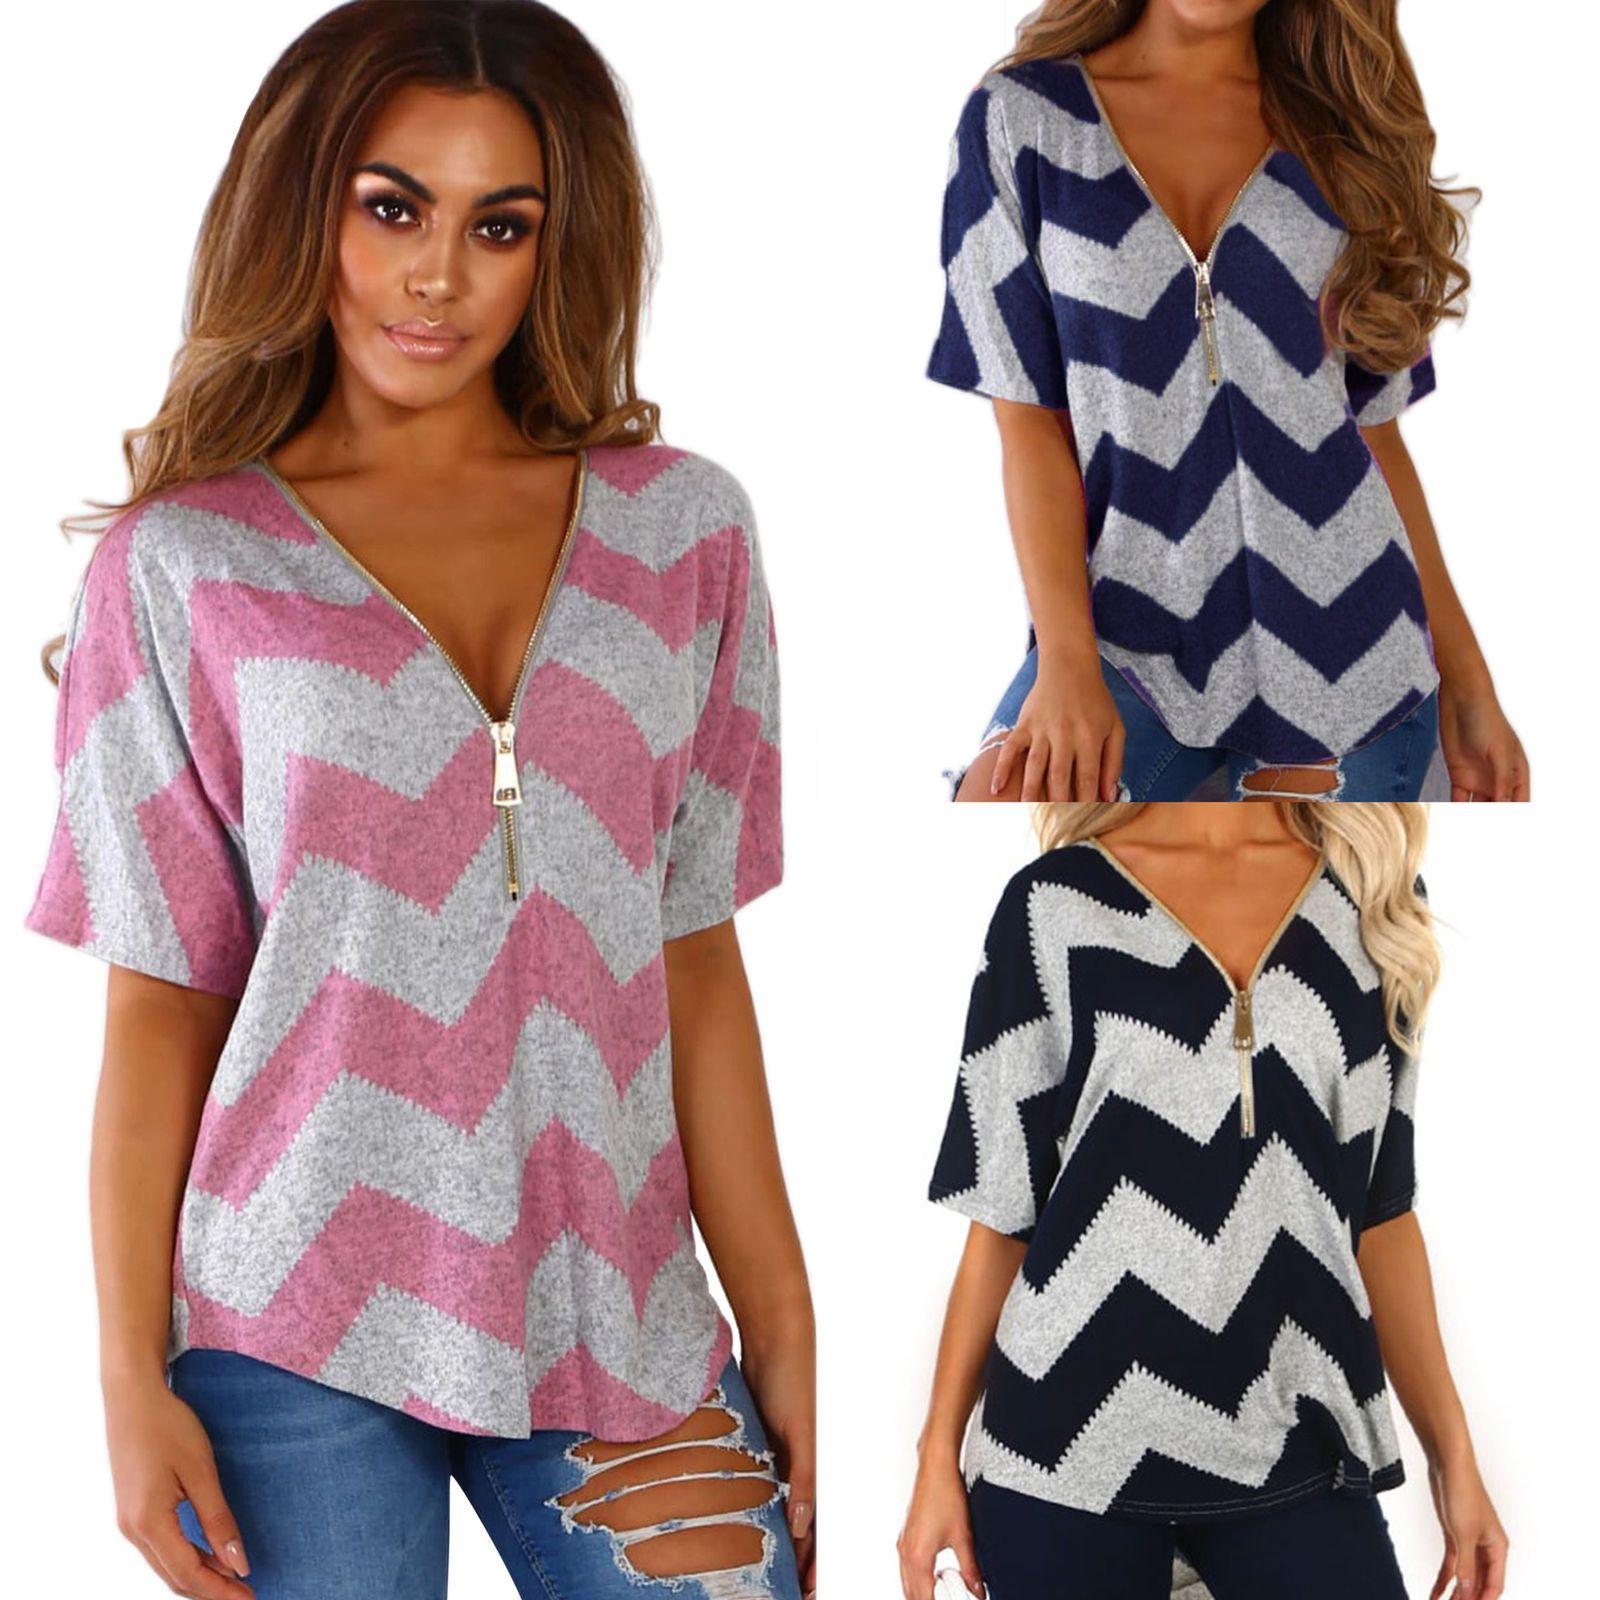 6a29e31bd112 Women Short Sleeve Loose T Shirts Fashion Ladies Summer Casual Blouse Tops  Shirt Shirt Pins